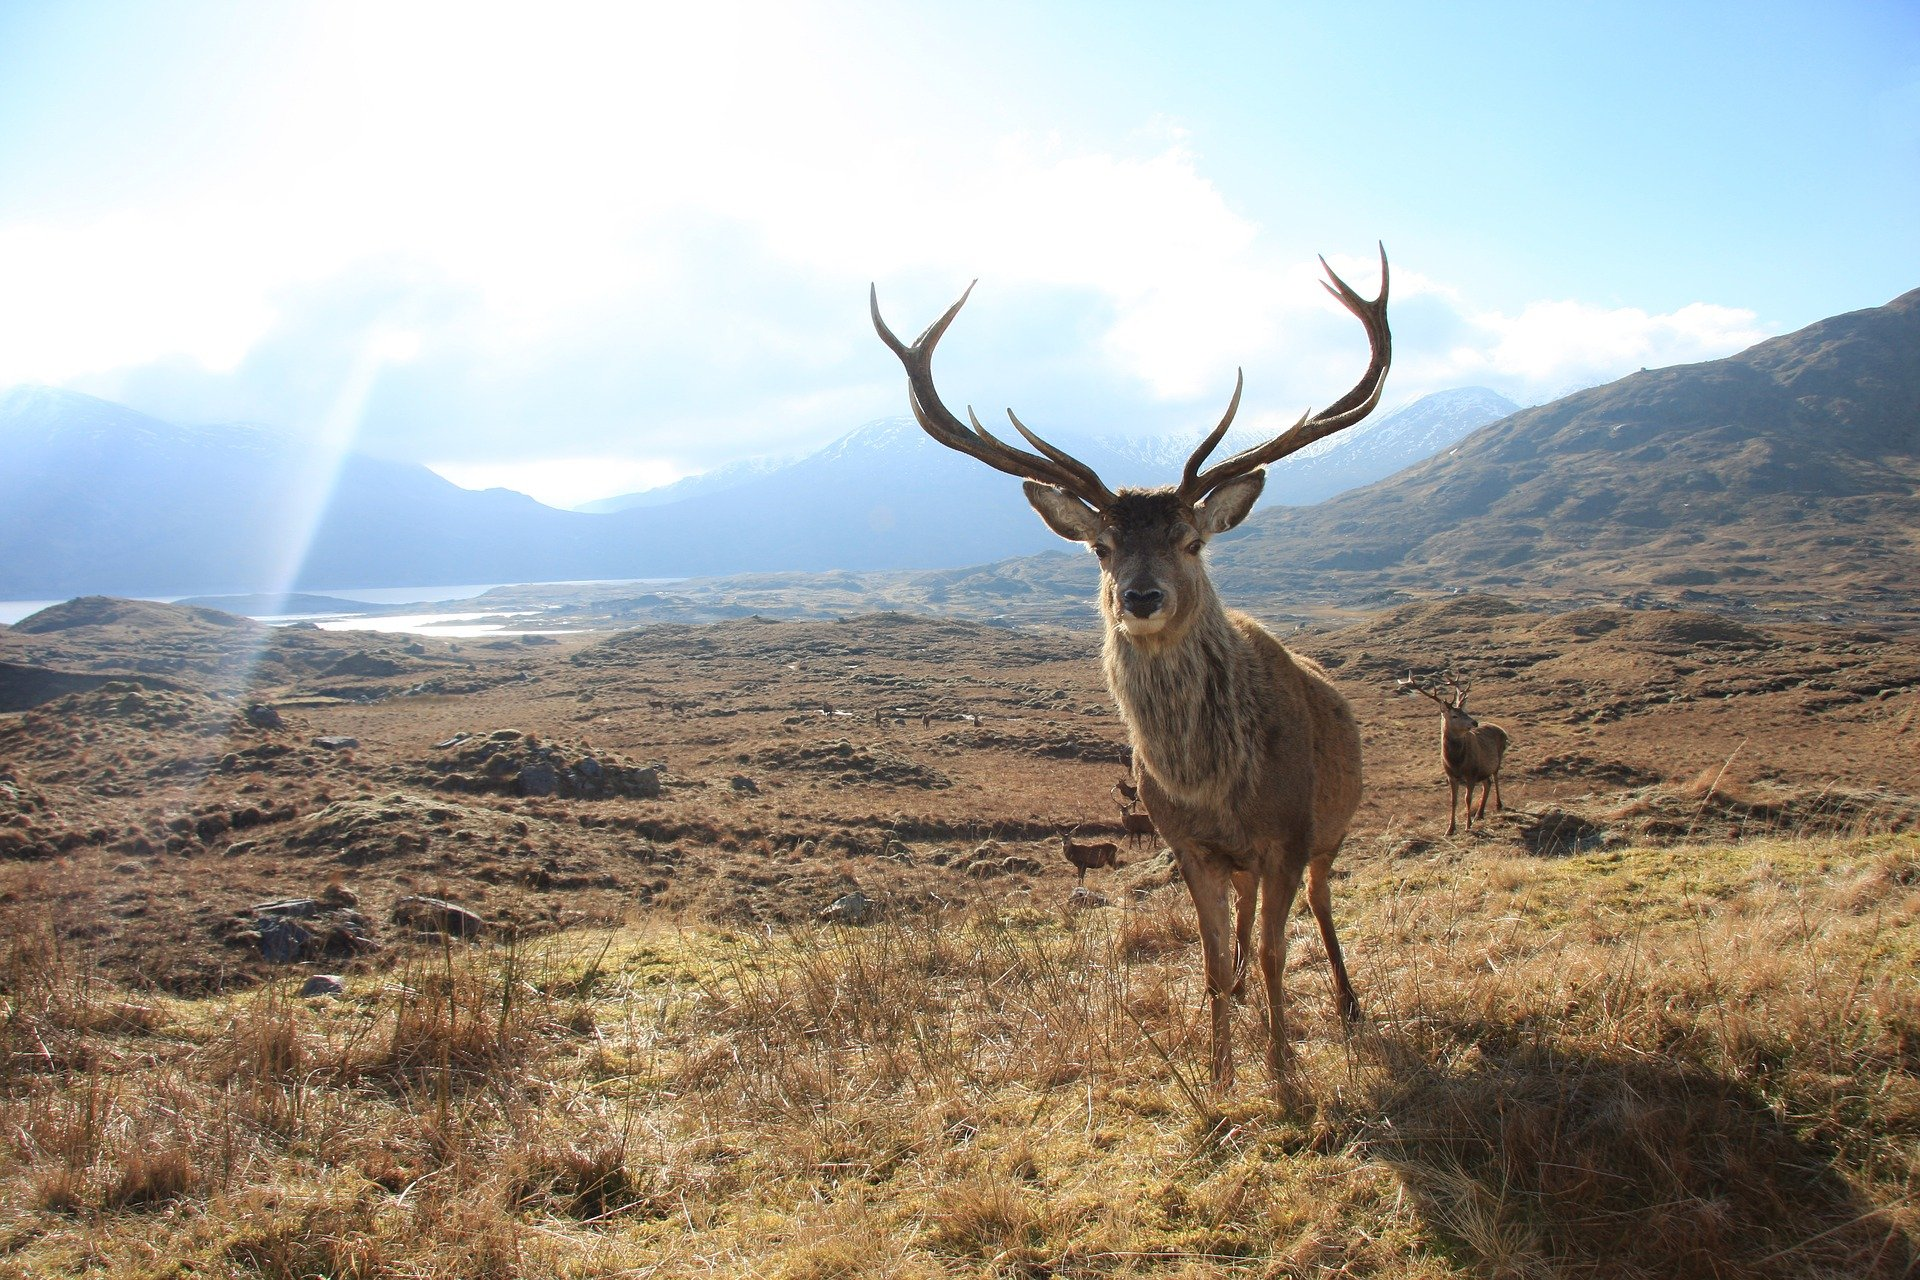 Stalking and hunting deer